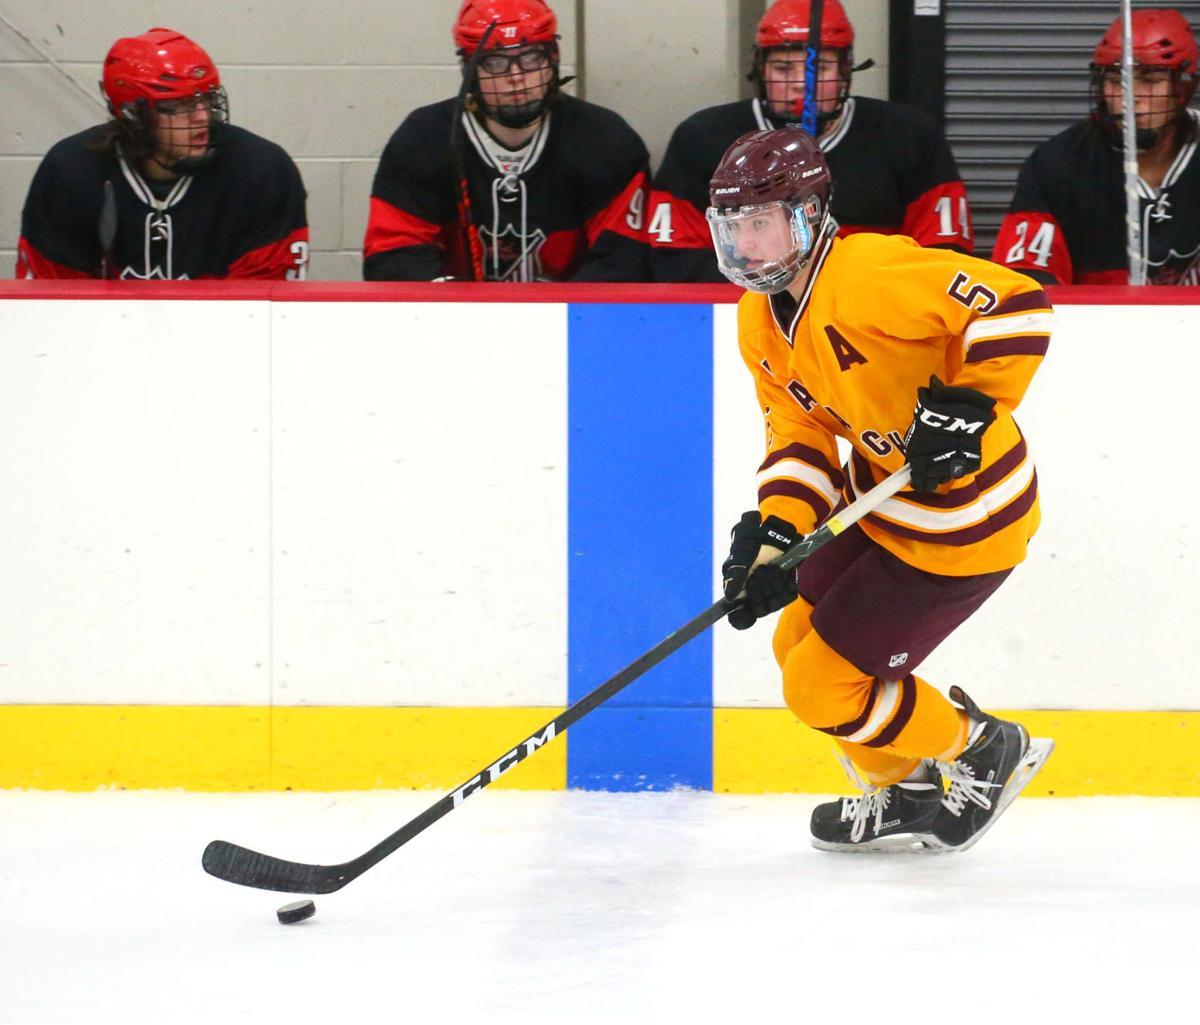 Avalanche La Crosse Hockey (SECONDARY)